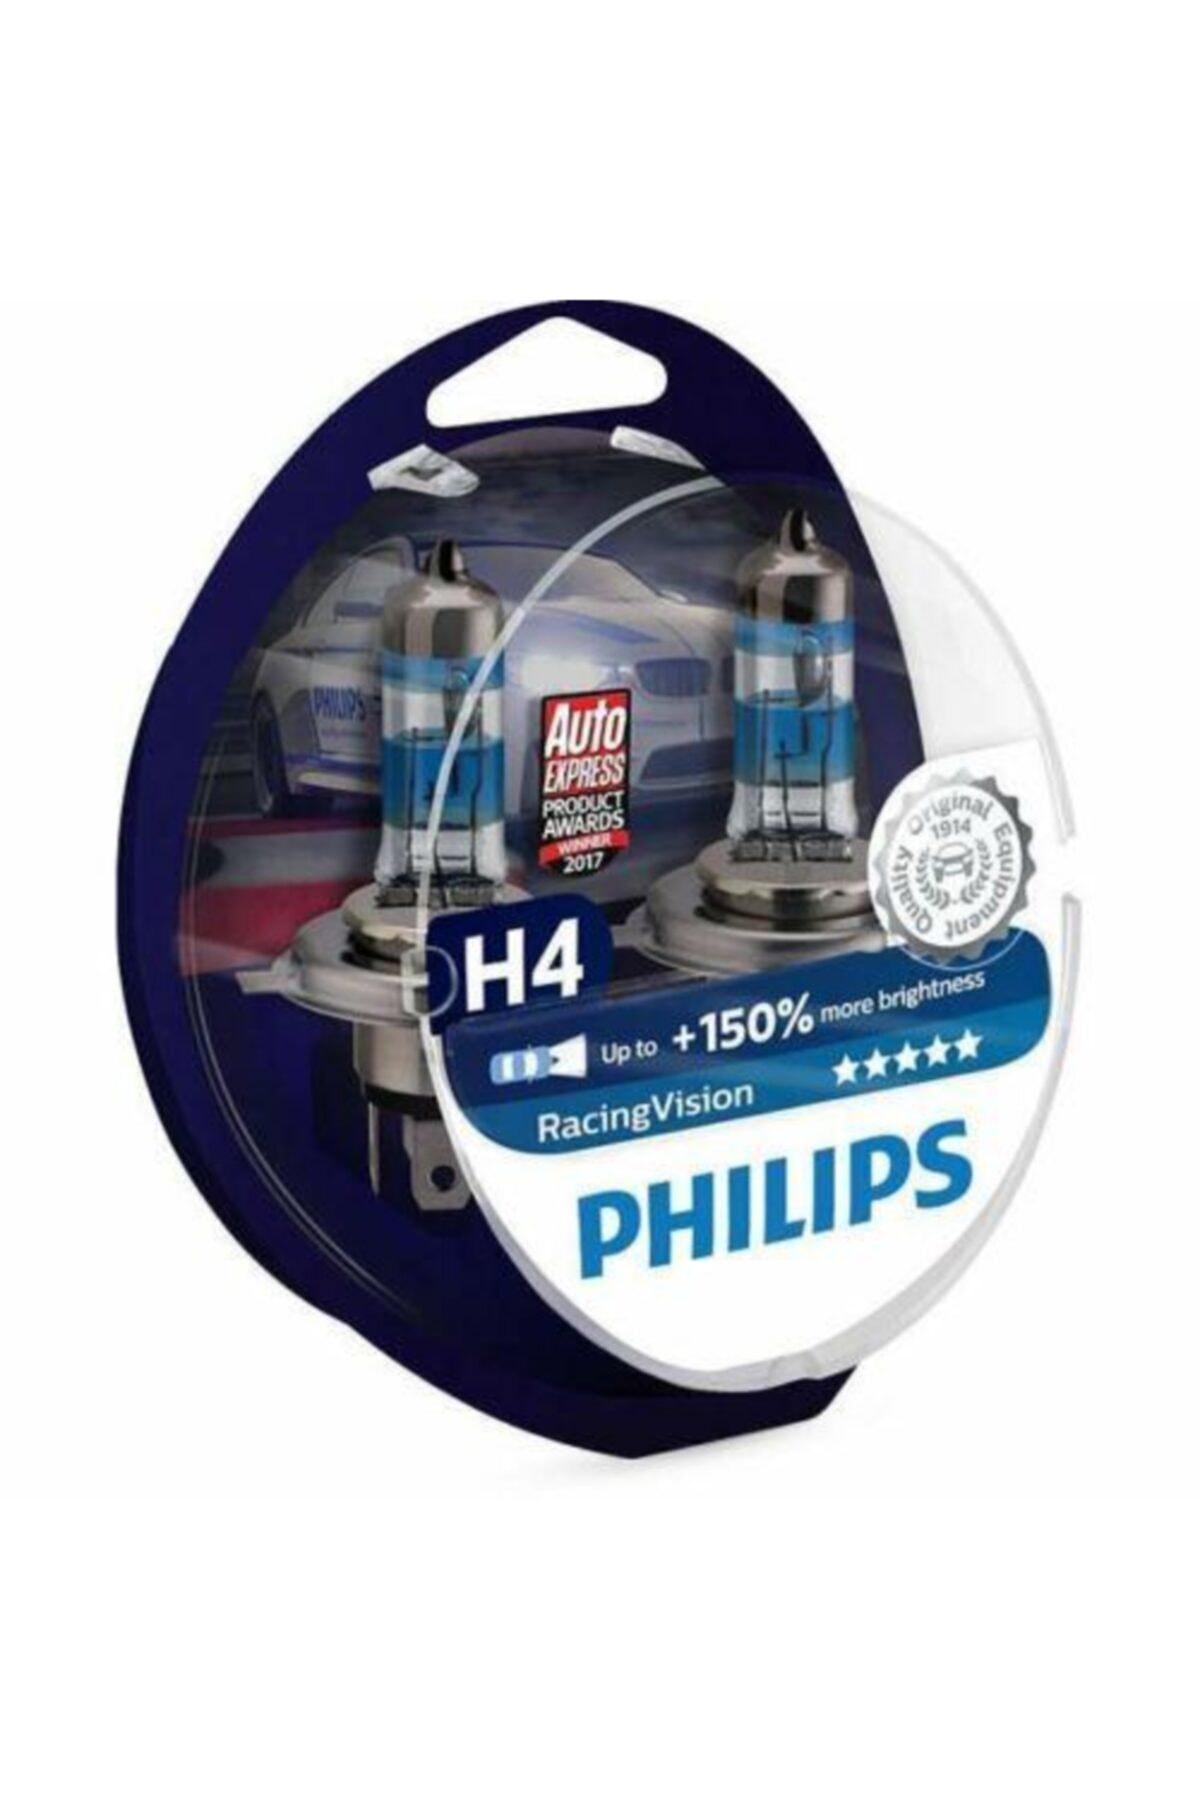 Philips Racing Vision H4 Ampul X-treme +%150 Fazla Işık 1